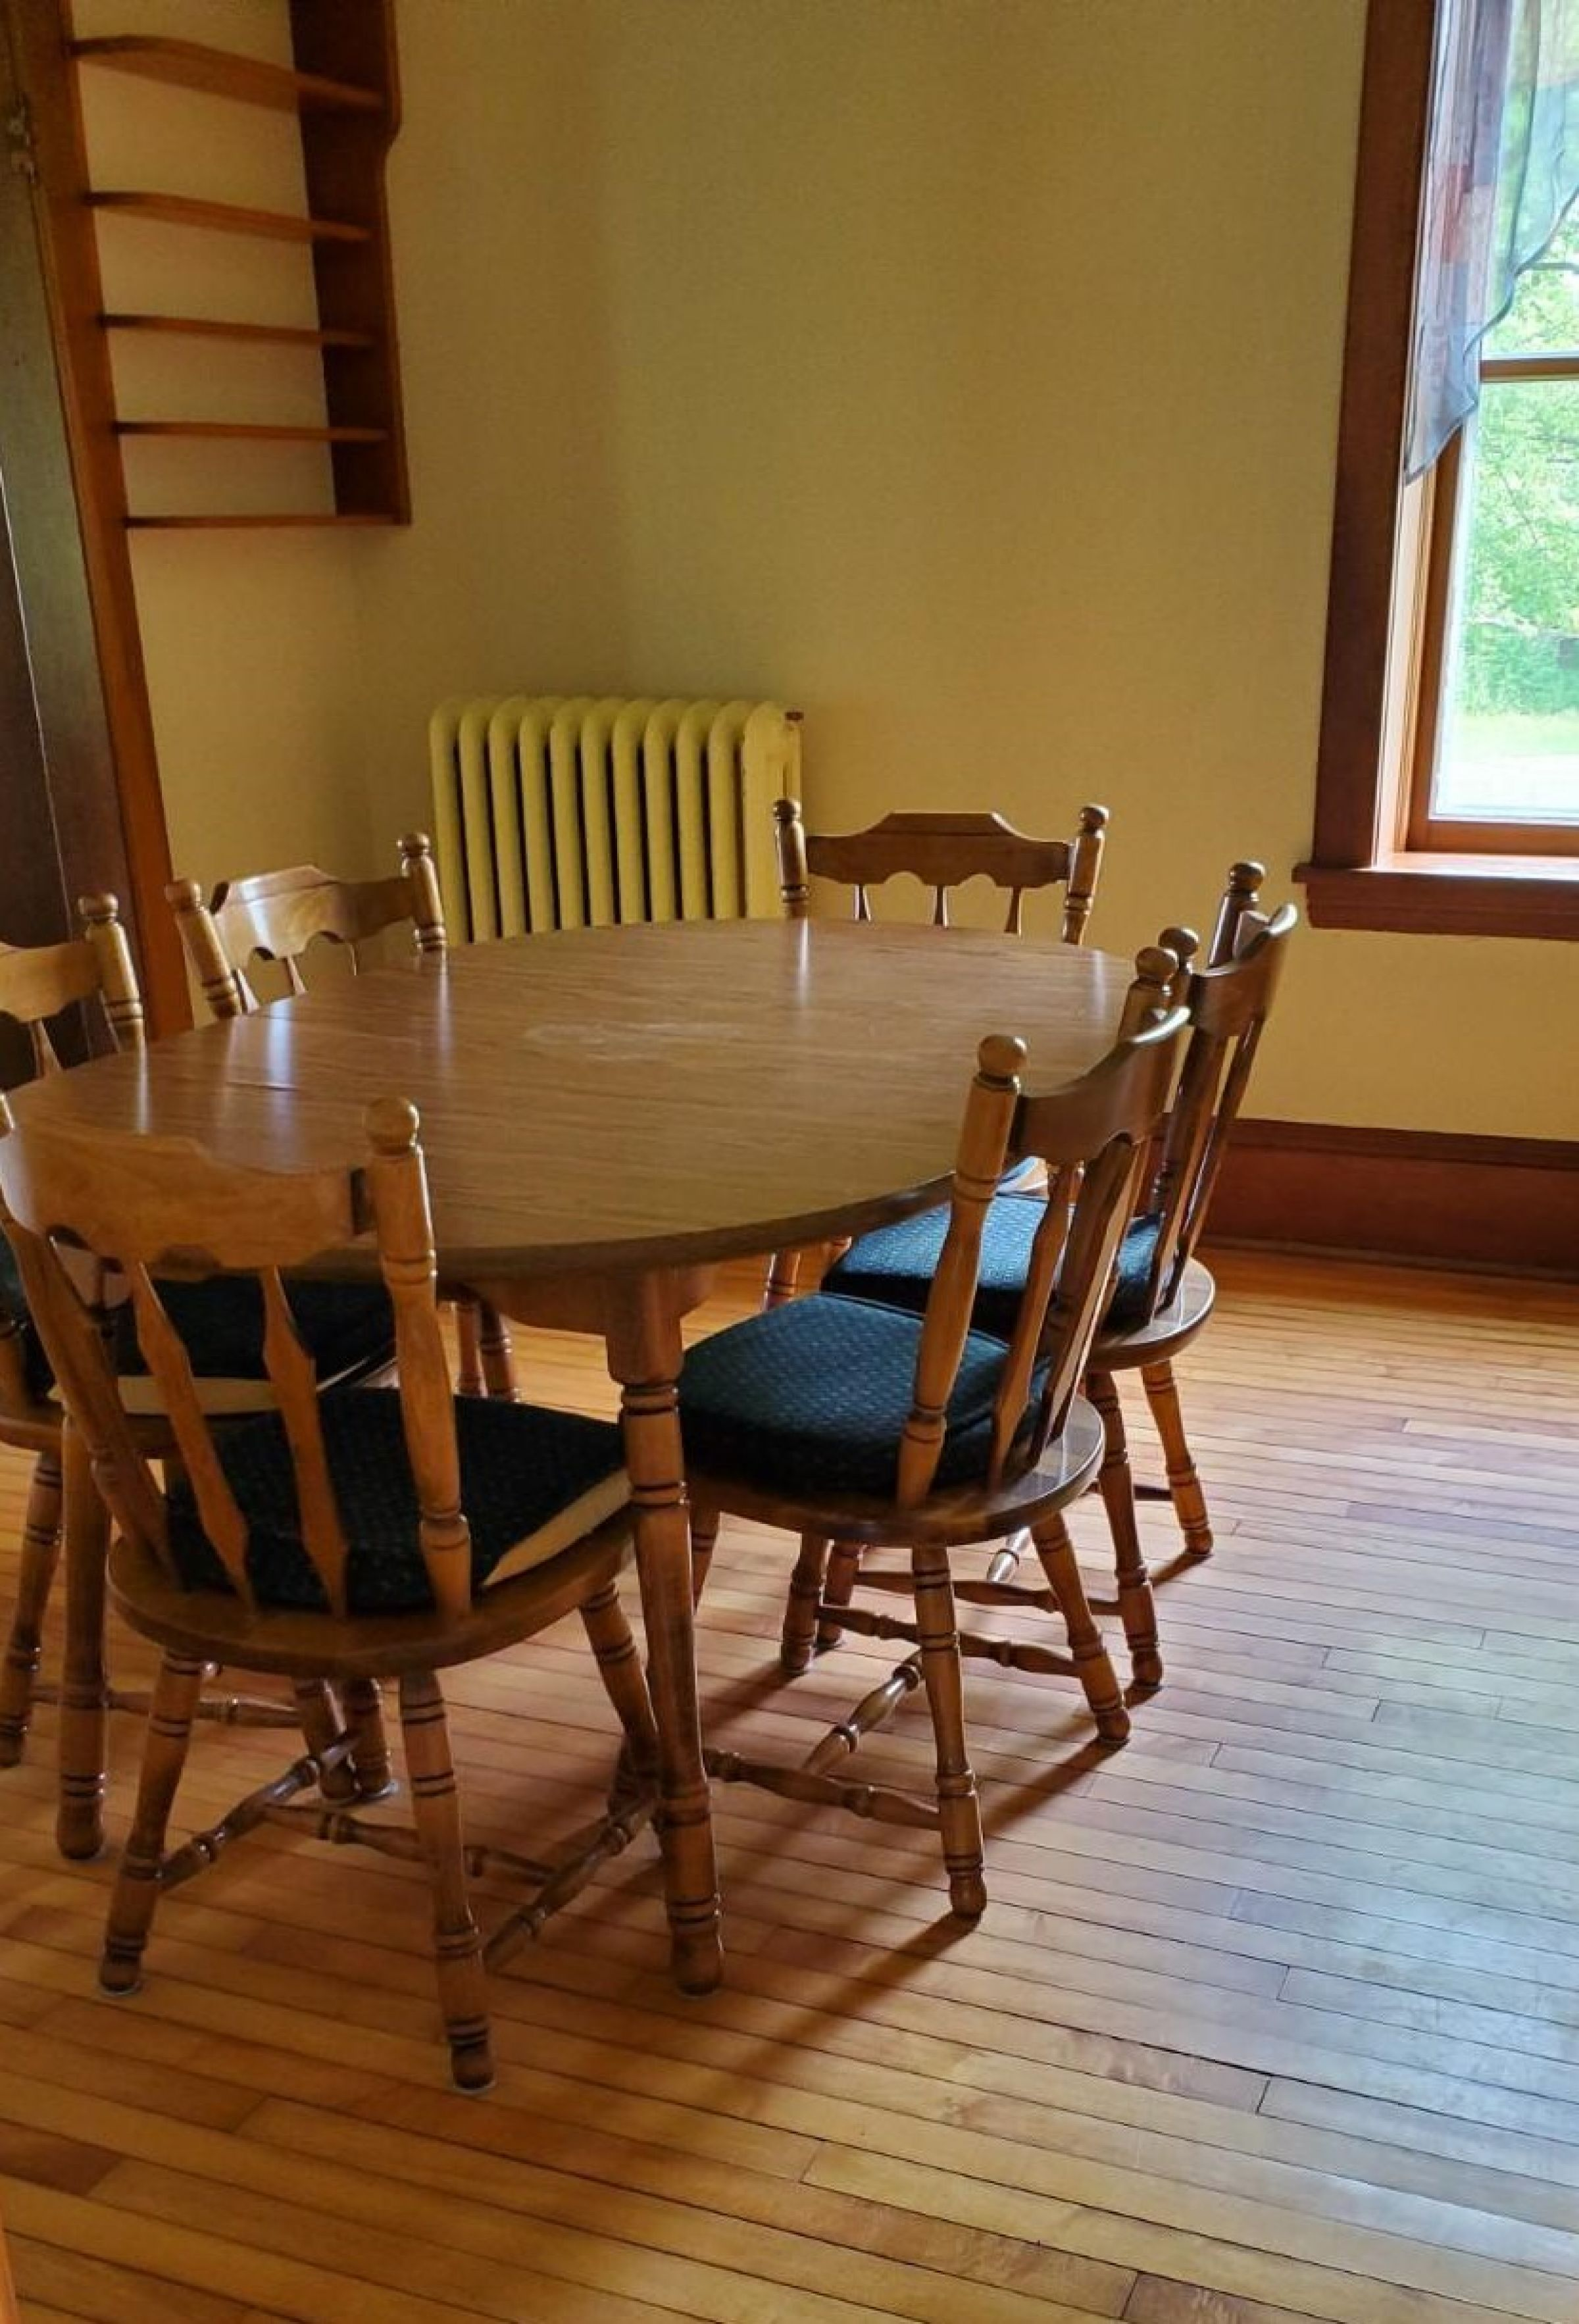 residential-land-mcleod-county-minnesota-80-acres-listing-number-15182-10-2020-09-23-163829.jpeg